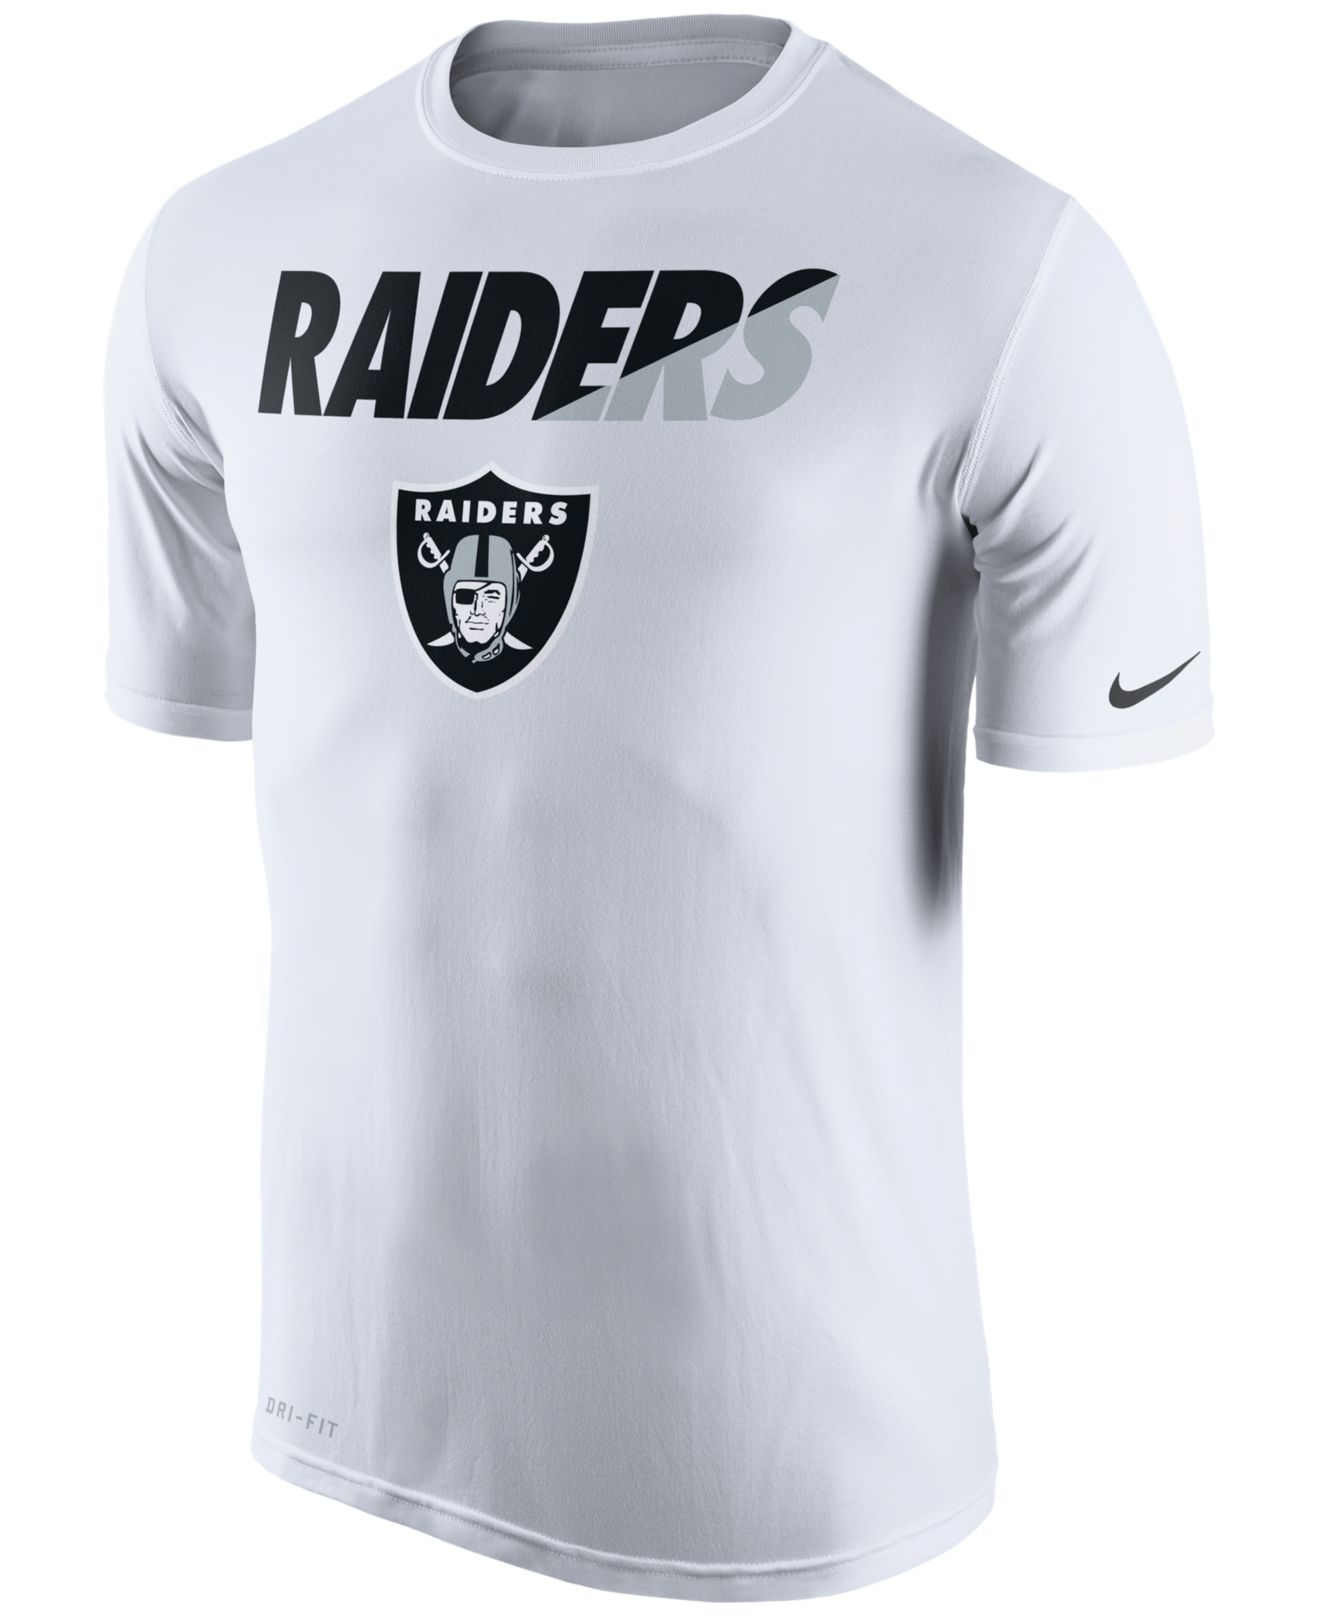 9f9939596 Nike Men's Oakland Raiders Legend Staff Practice T-shirt in White ...